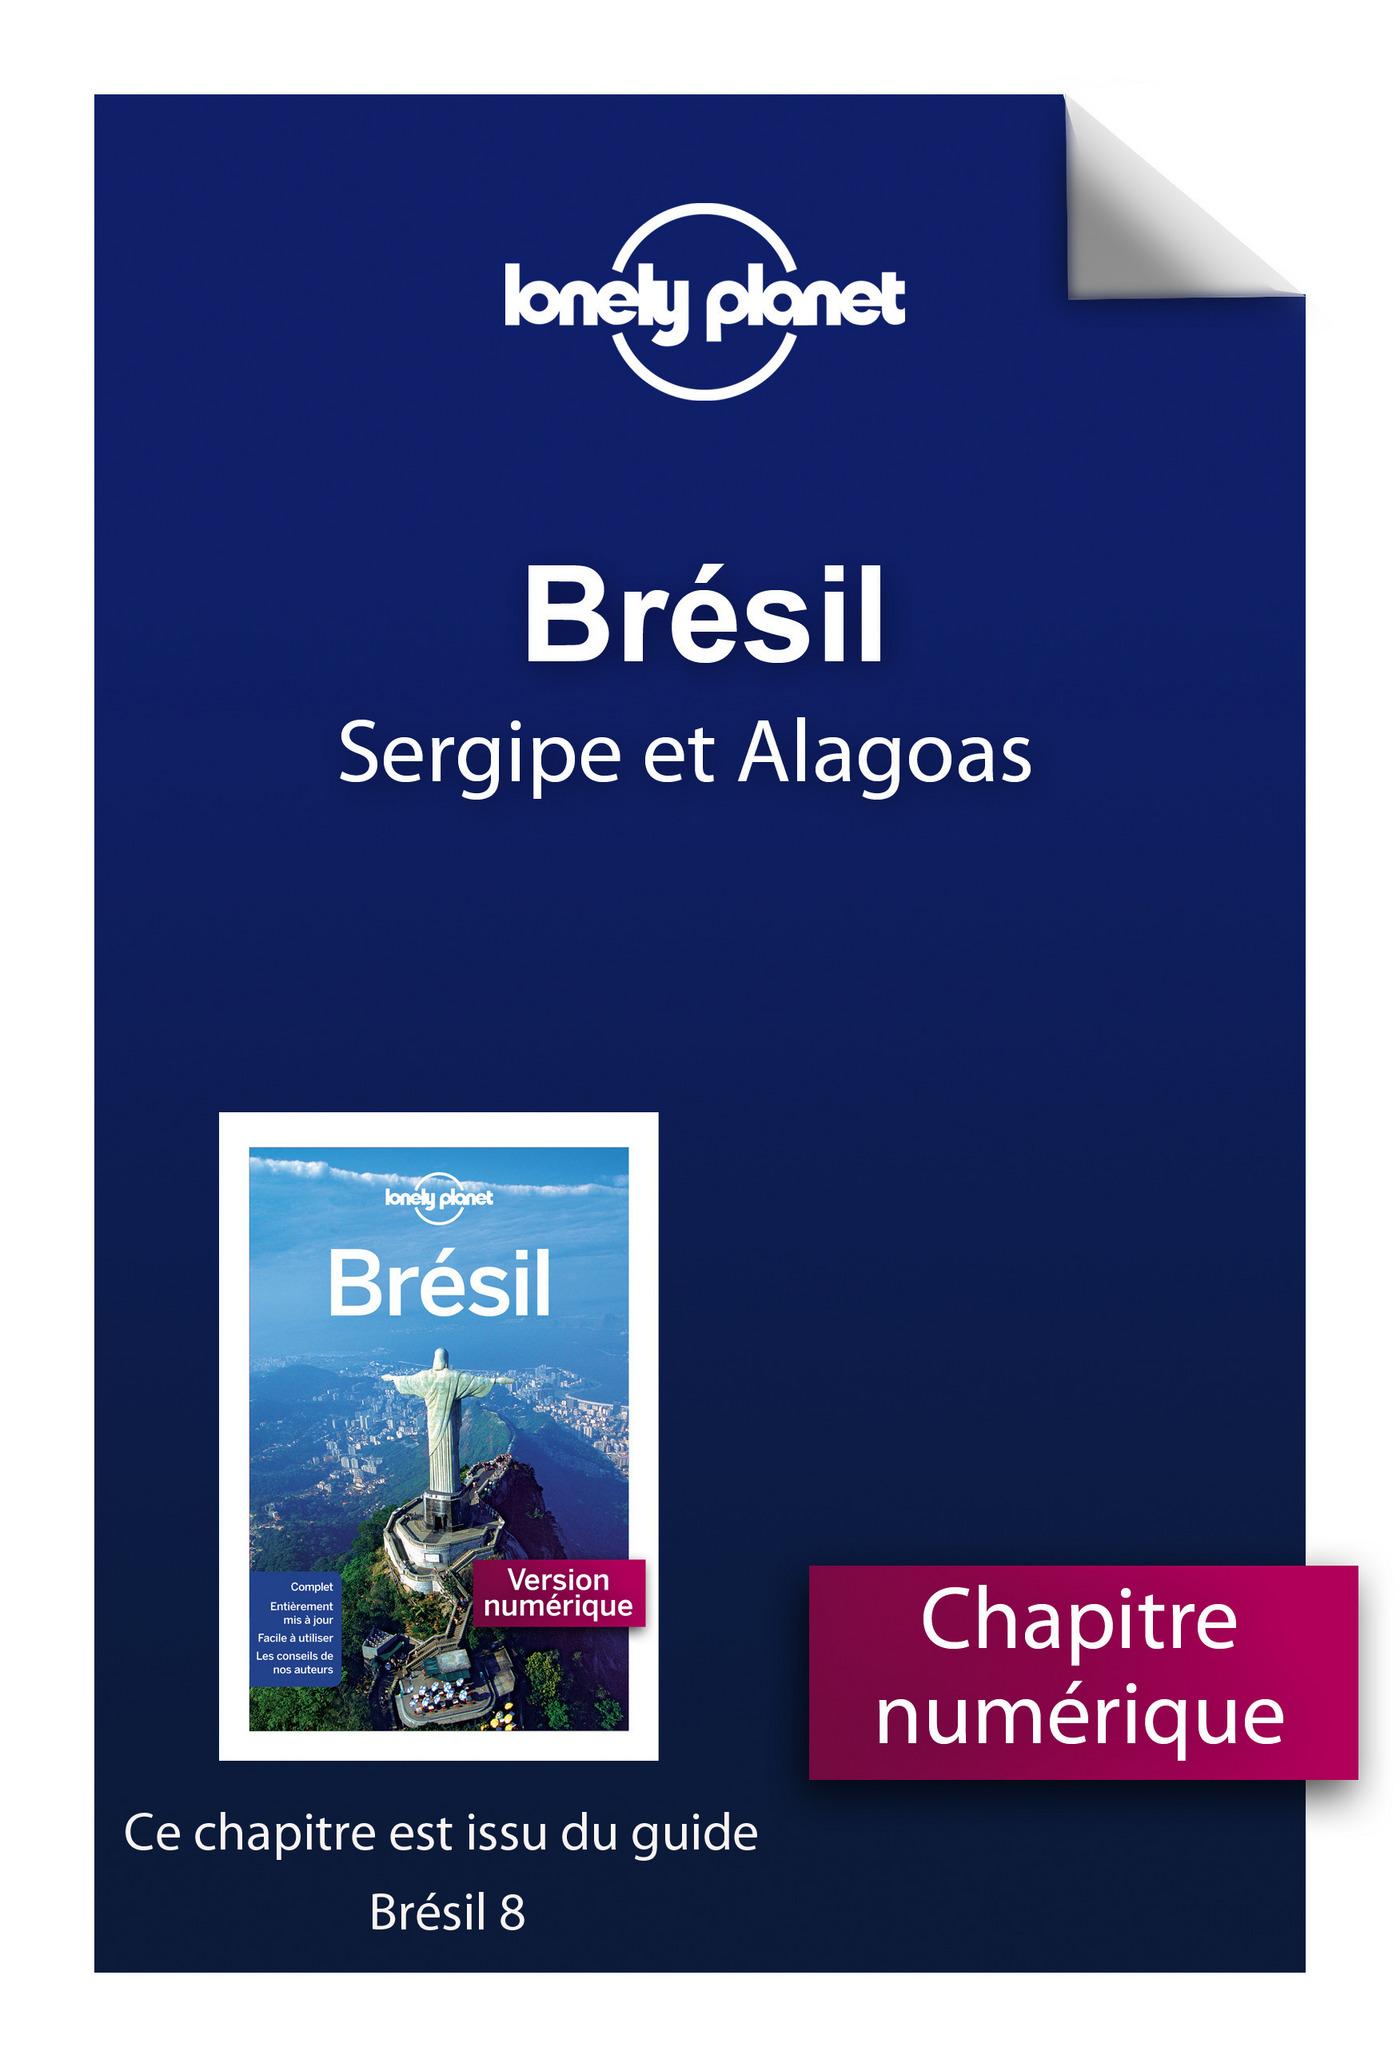 Brésil 8 - Sergipe et Alagoas